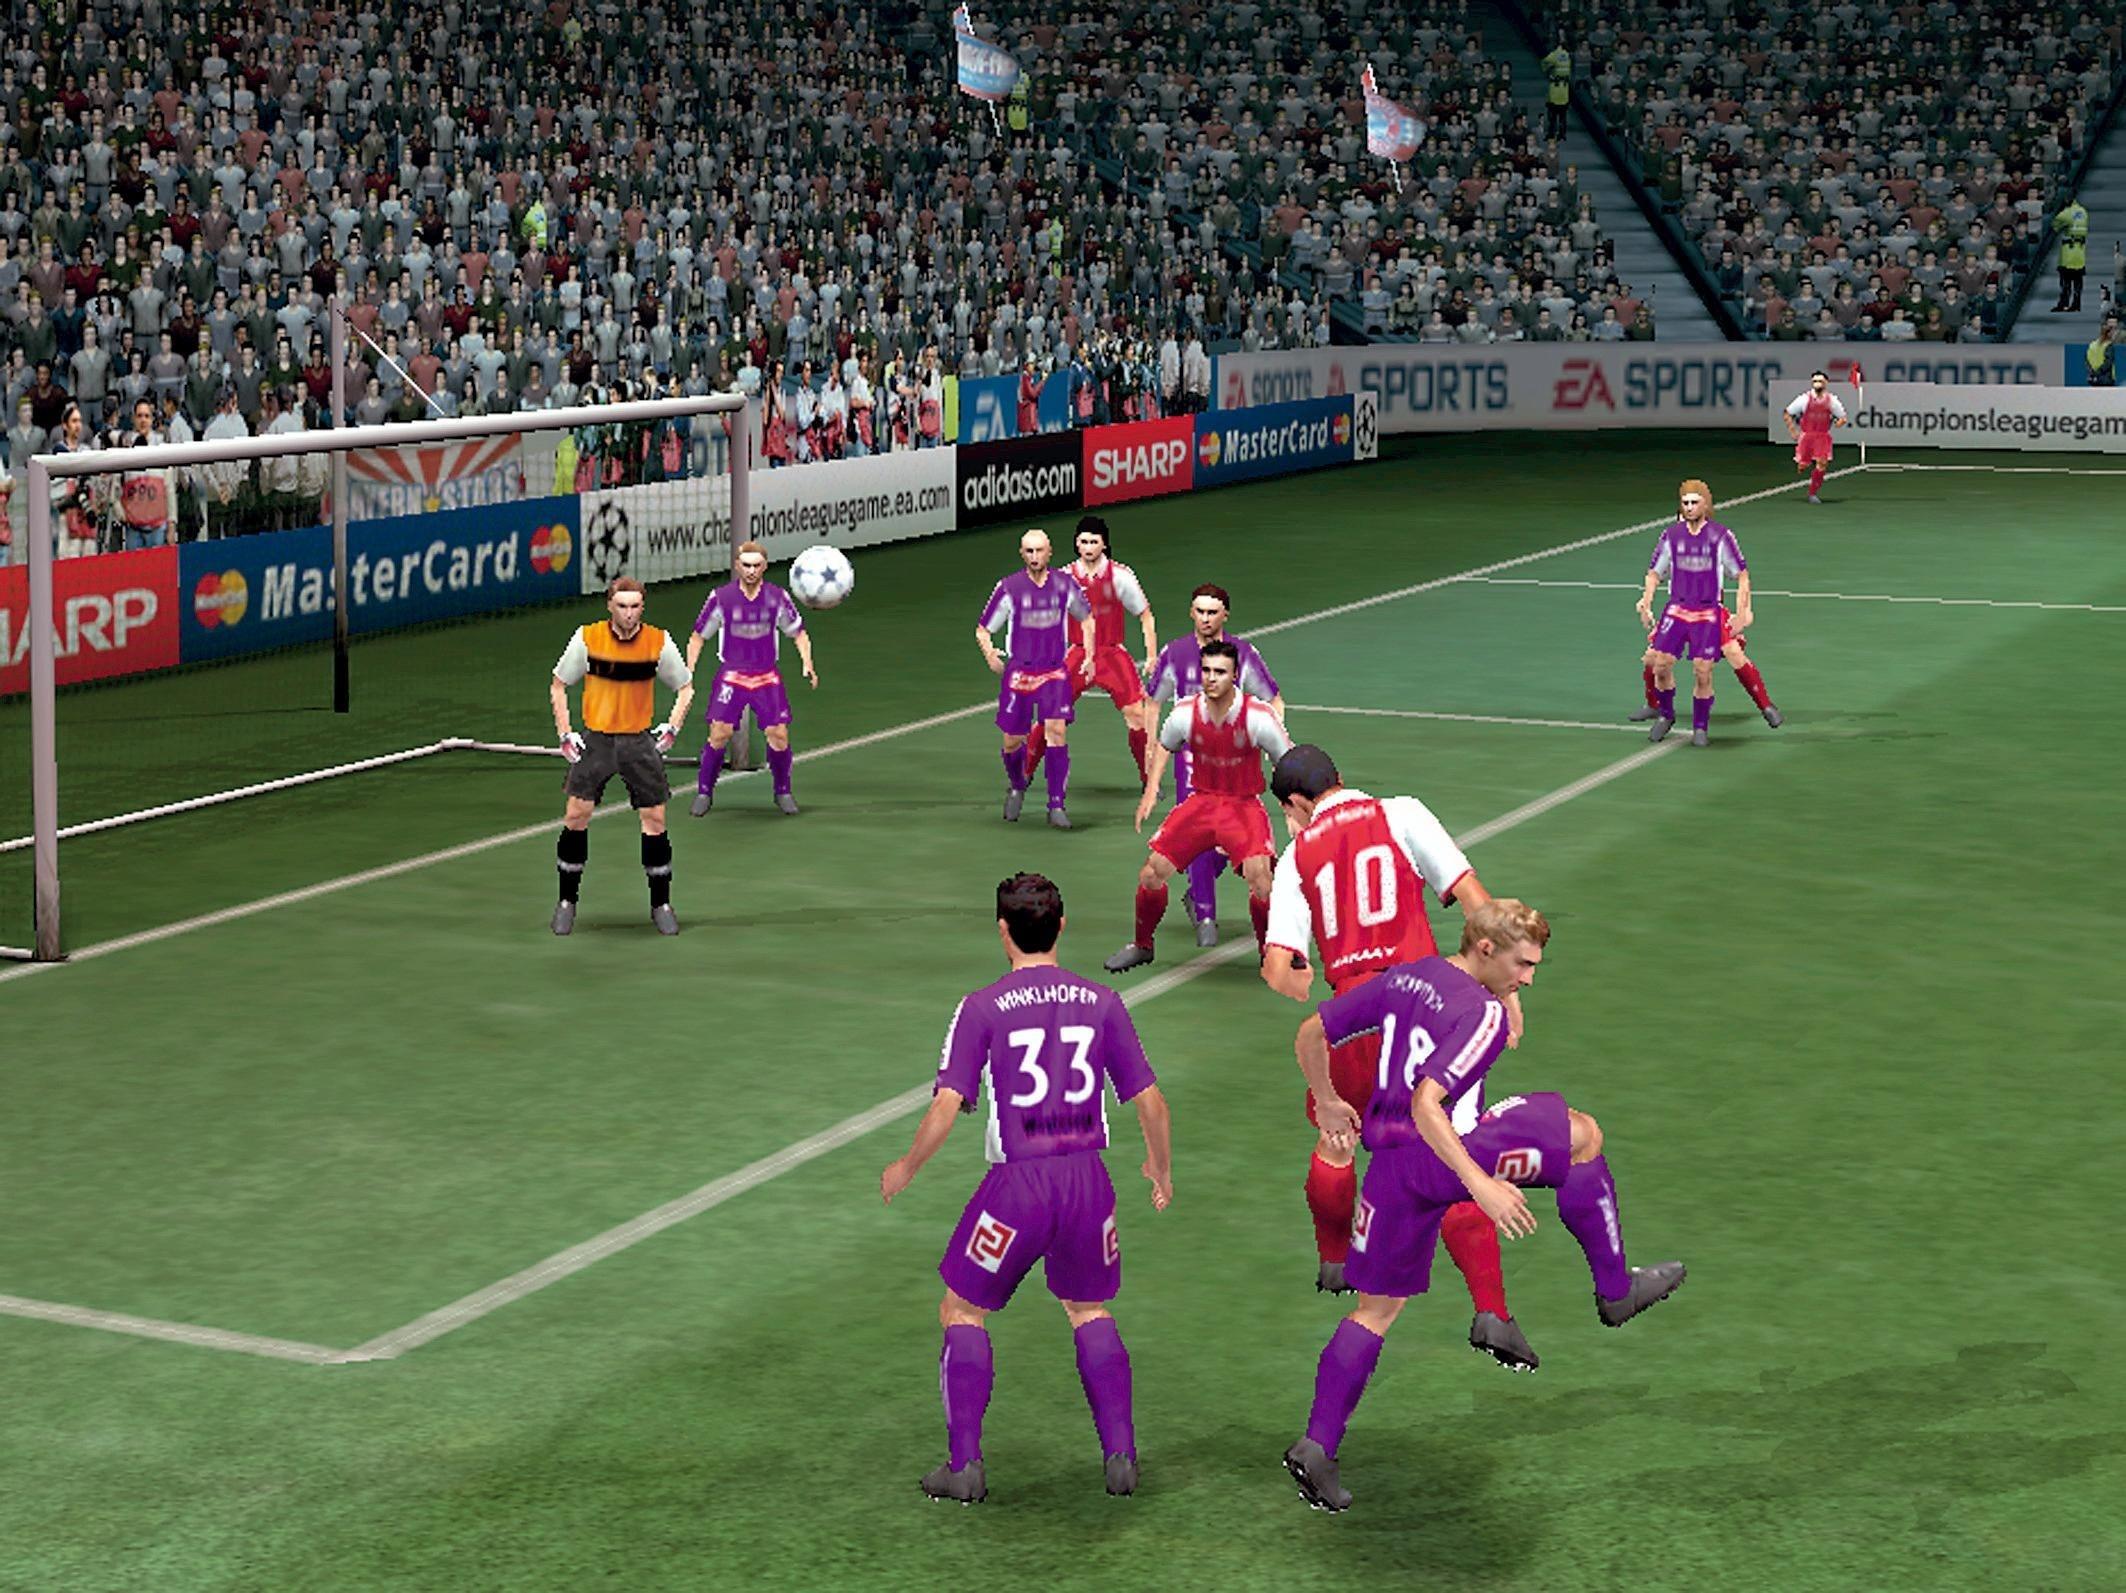 uefa champions league spiele